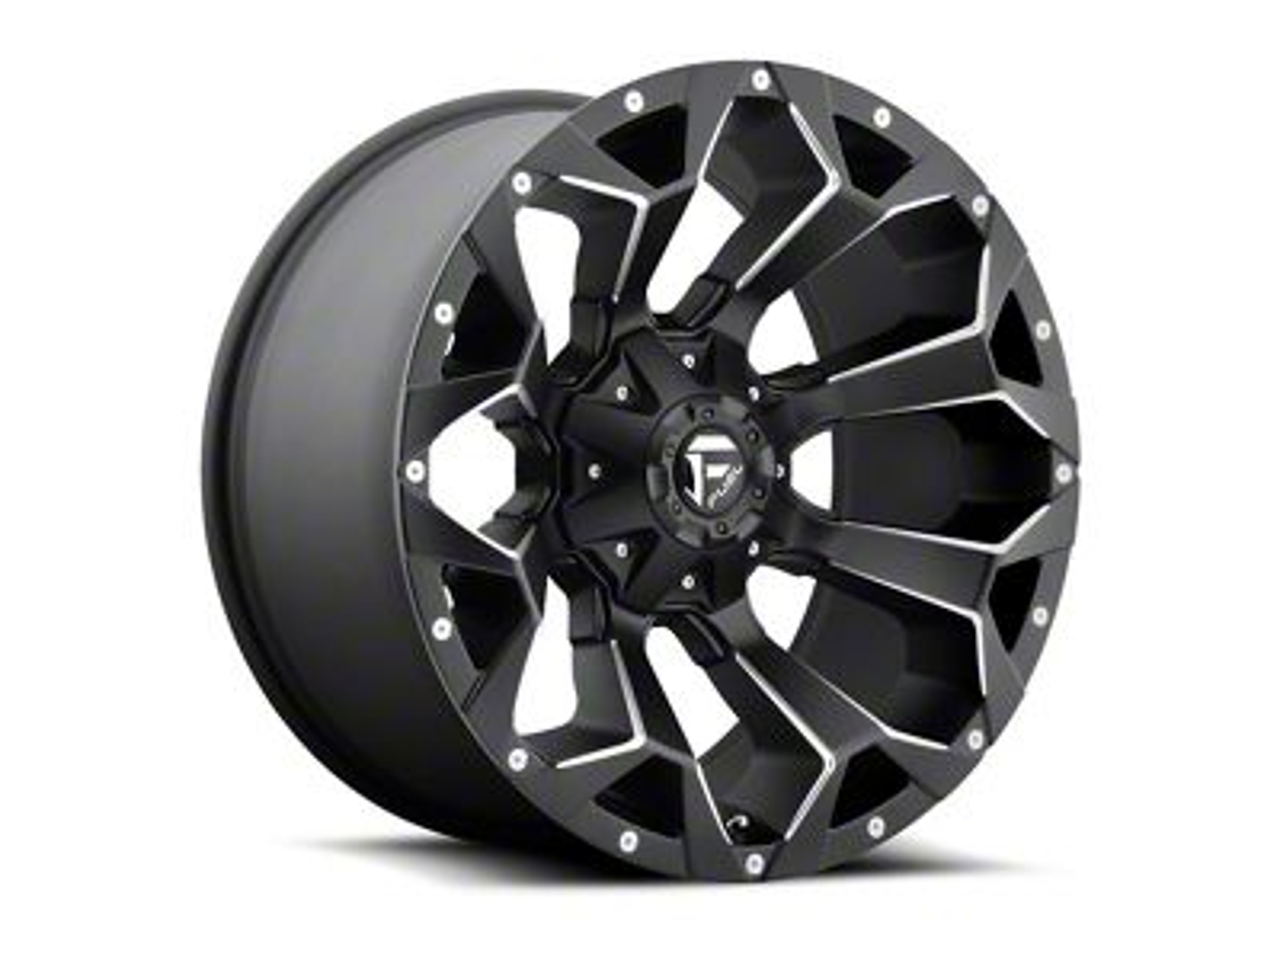 Fuel Wheels Assault Black Milled 6-Lug Wheel - 22x12 (07-18 Sierra 1500)